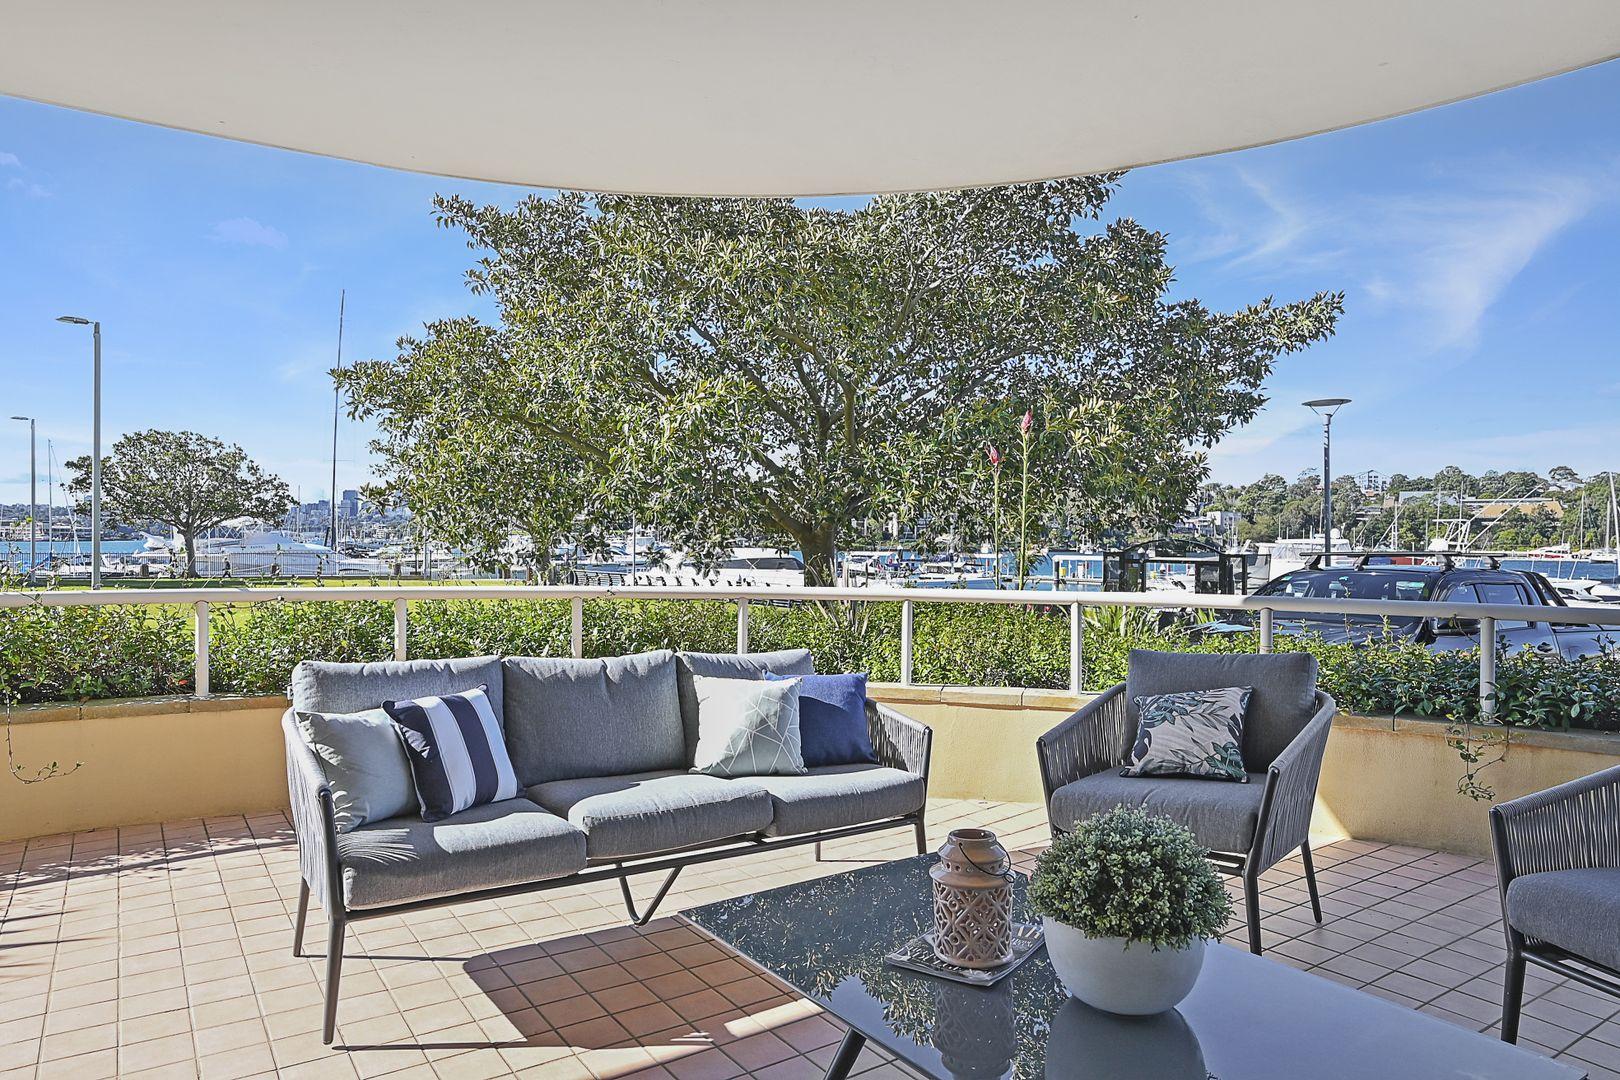 2 bedrooms Apartment / Unit / Flat in 102/1 Roseby Street DRUMMOYNE NSW, 2047